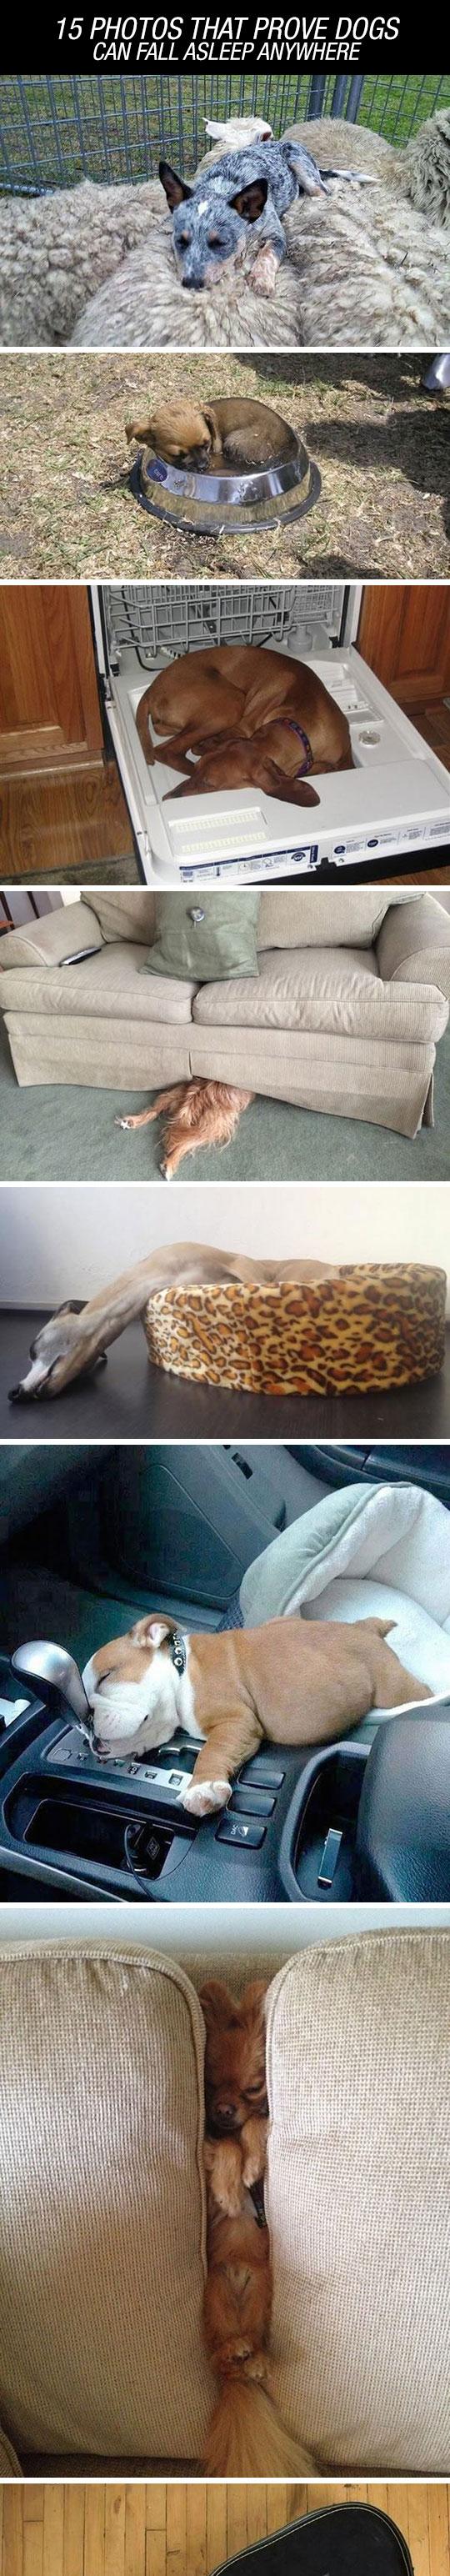 They Sleep Everywhere